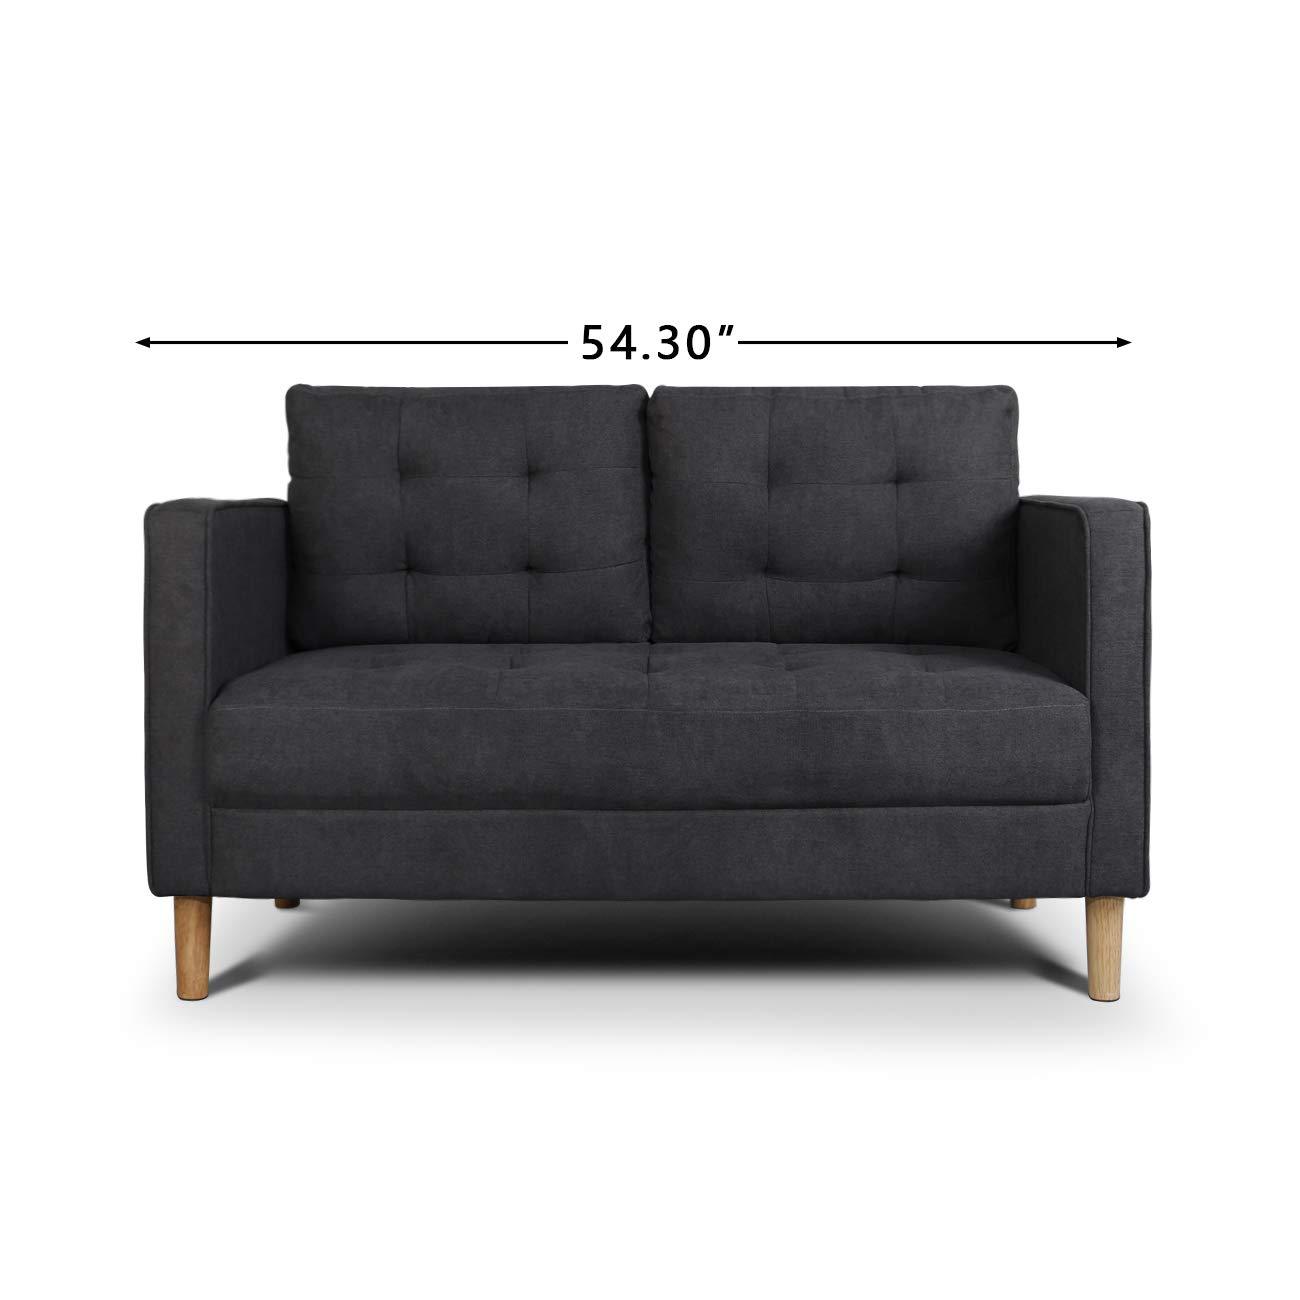 "AODAILIHB Modern Soft Cloth Tufted Cushion Loveseat Sofa Small Space Configurable Couch 54.3"" (Dark Grey)"